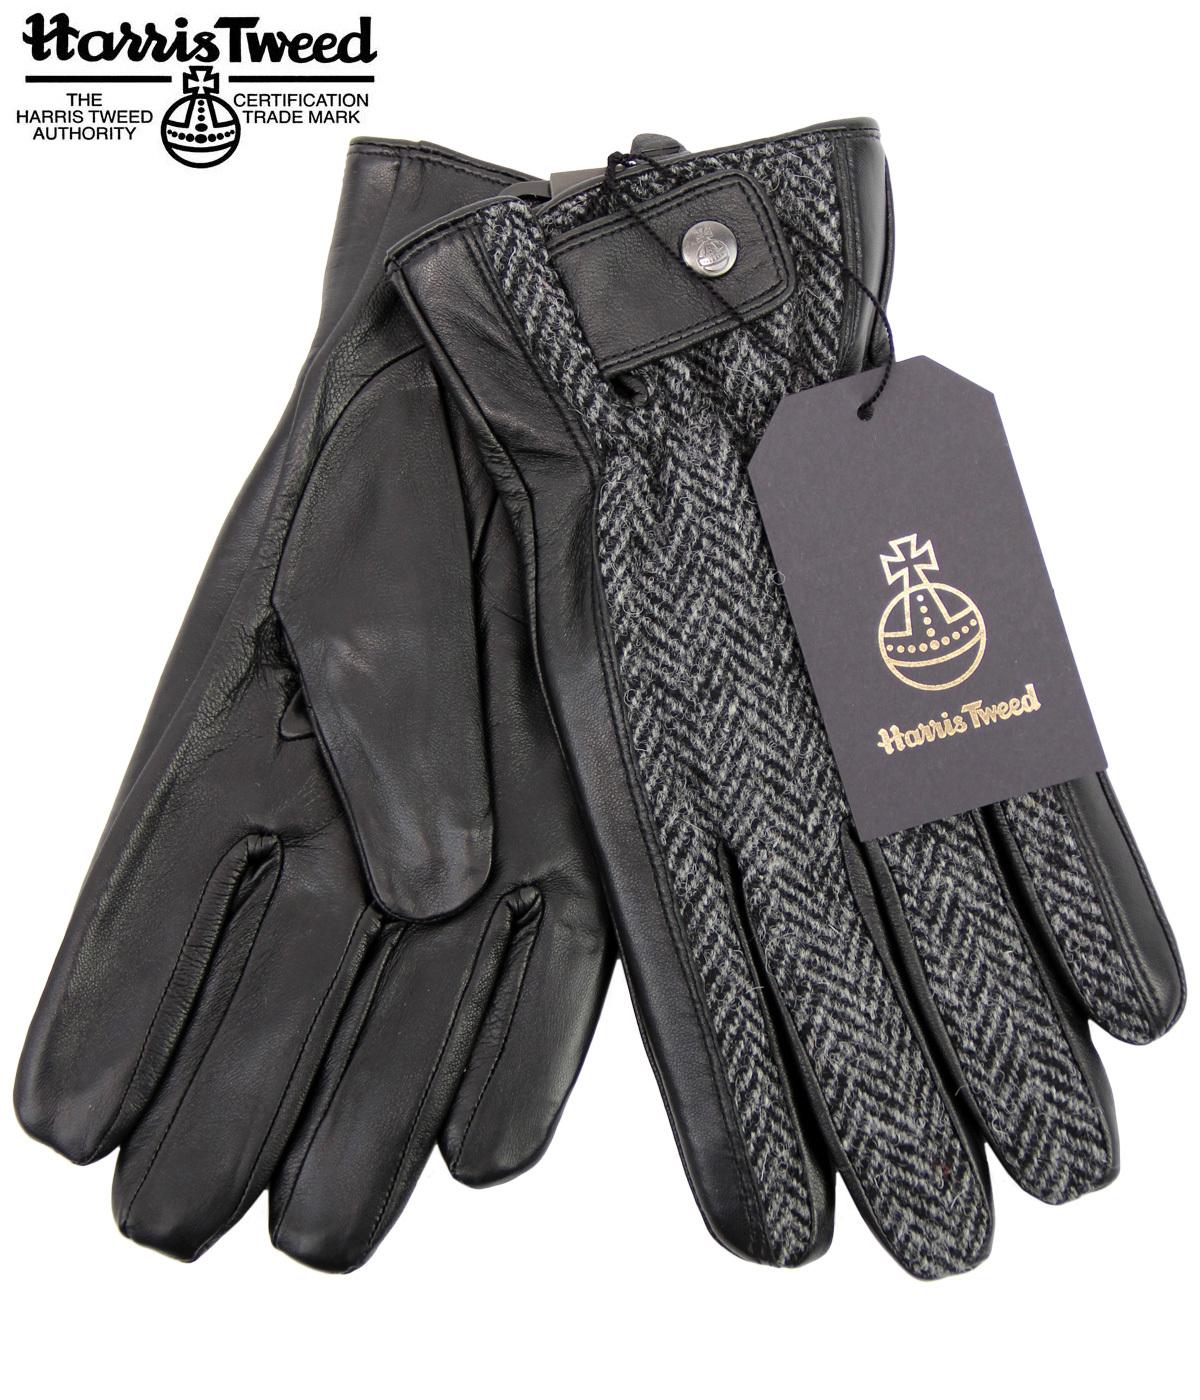 Rodel FAILSWORTH Harris Tweed & Leather 70s Gloves